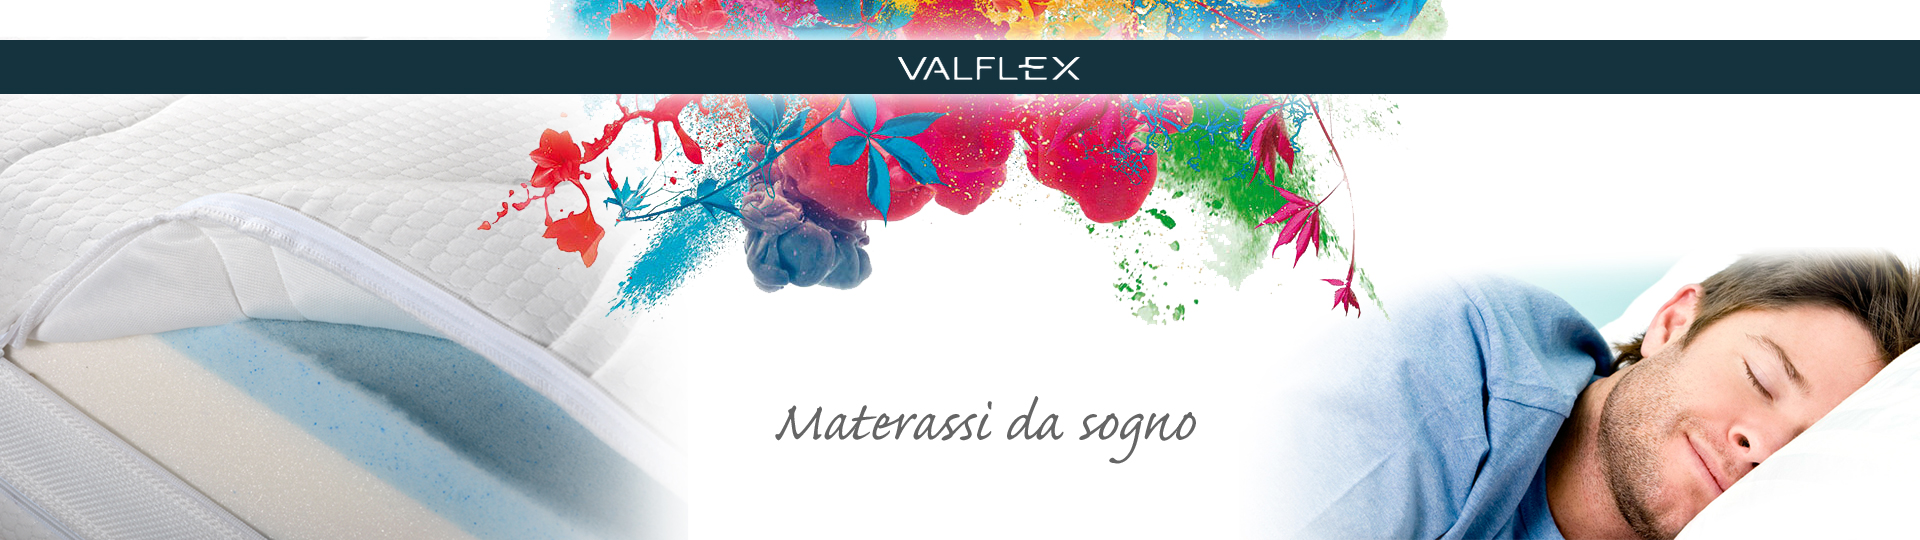 valflex - materassi da sogno